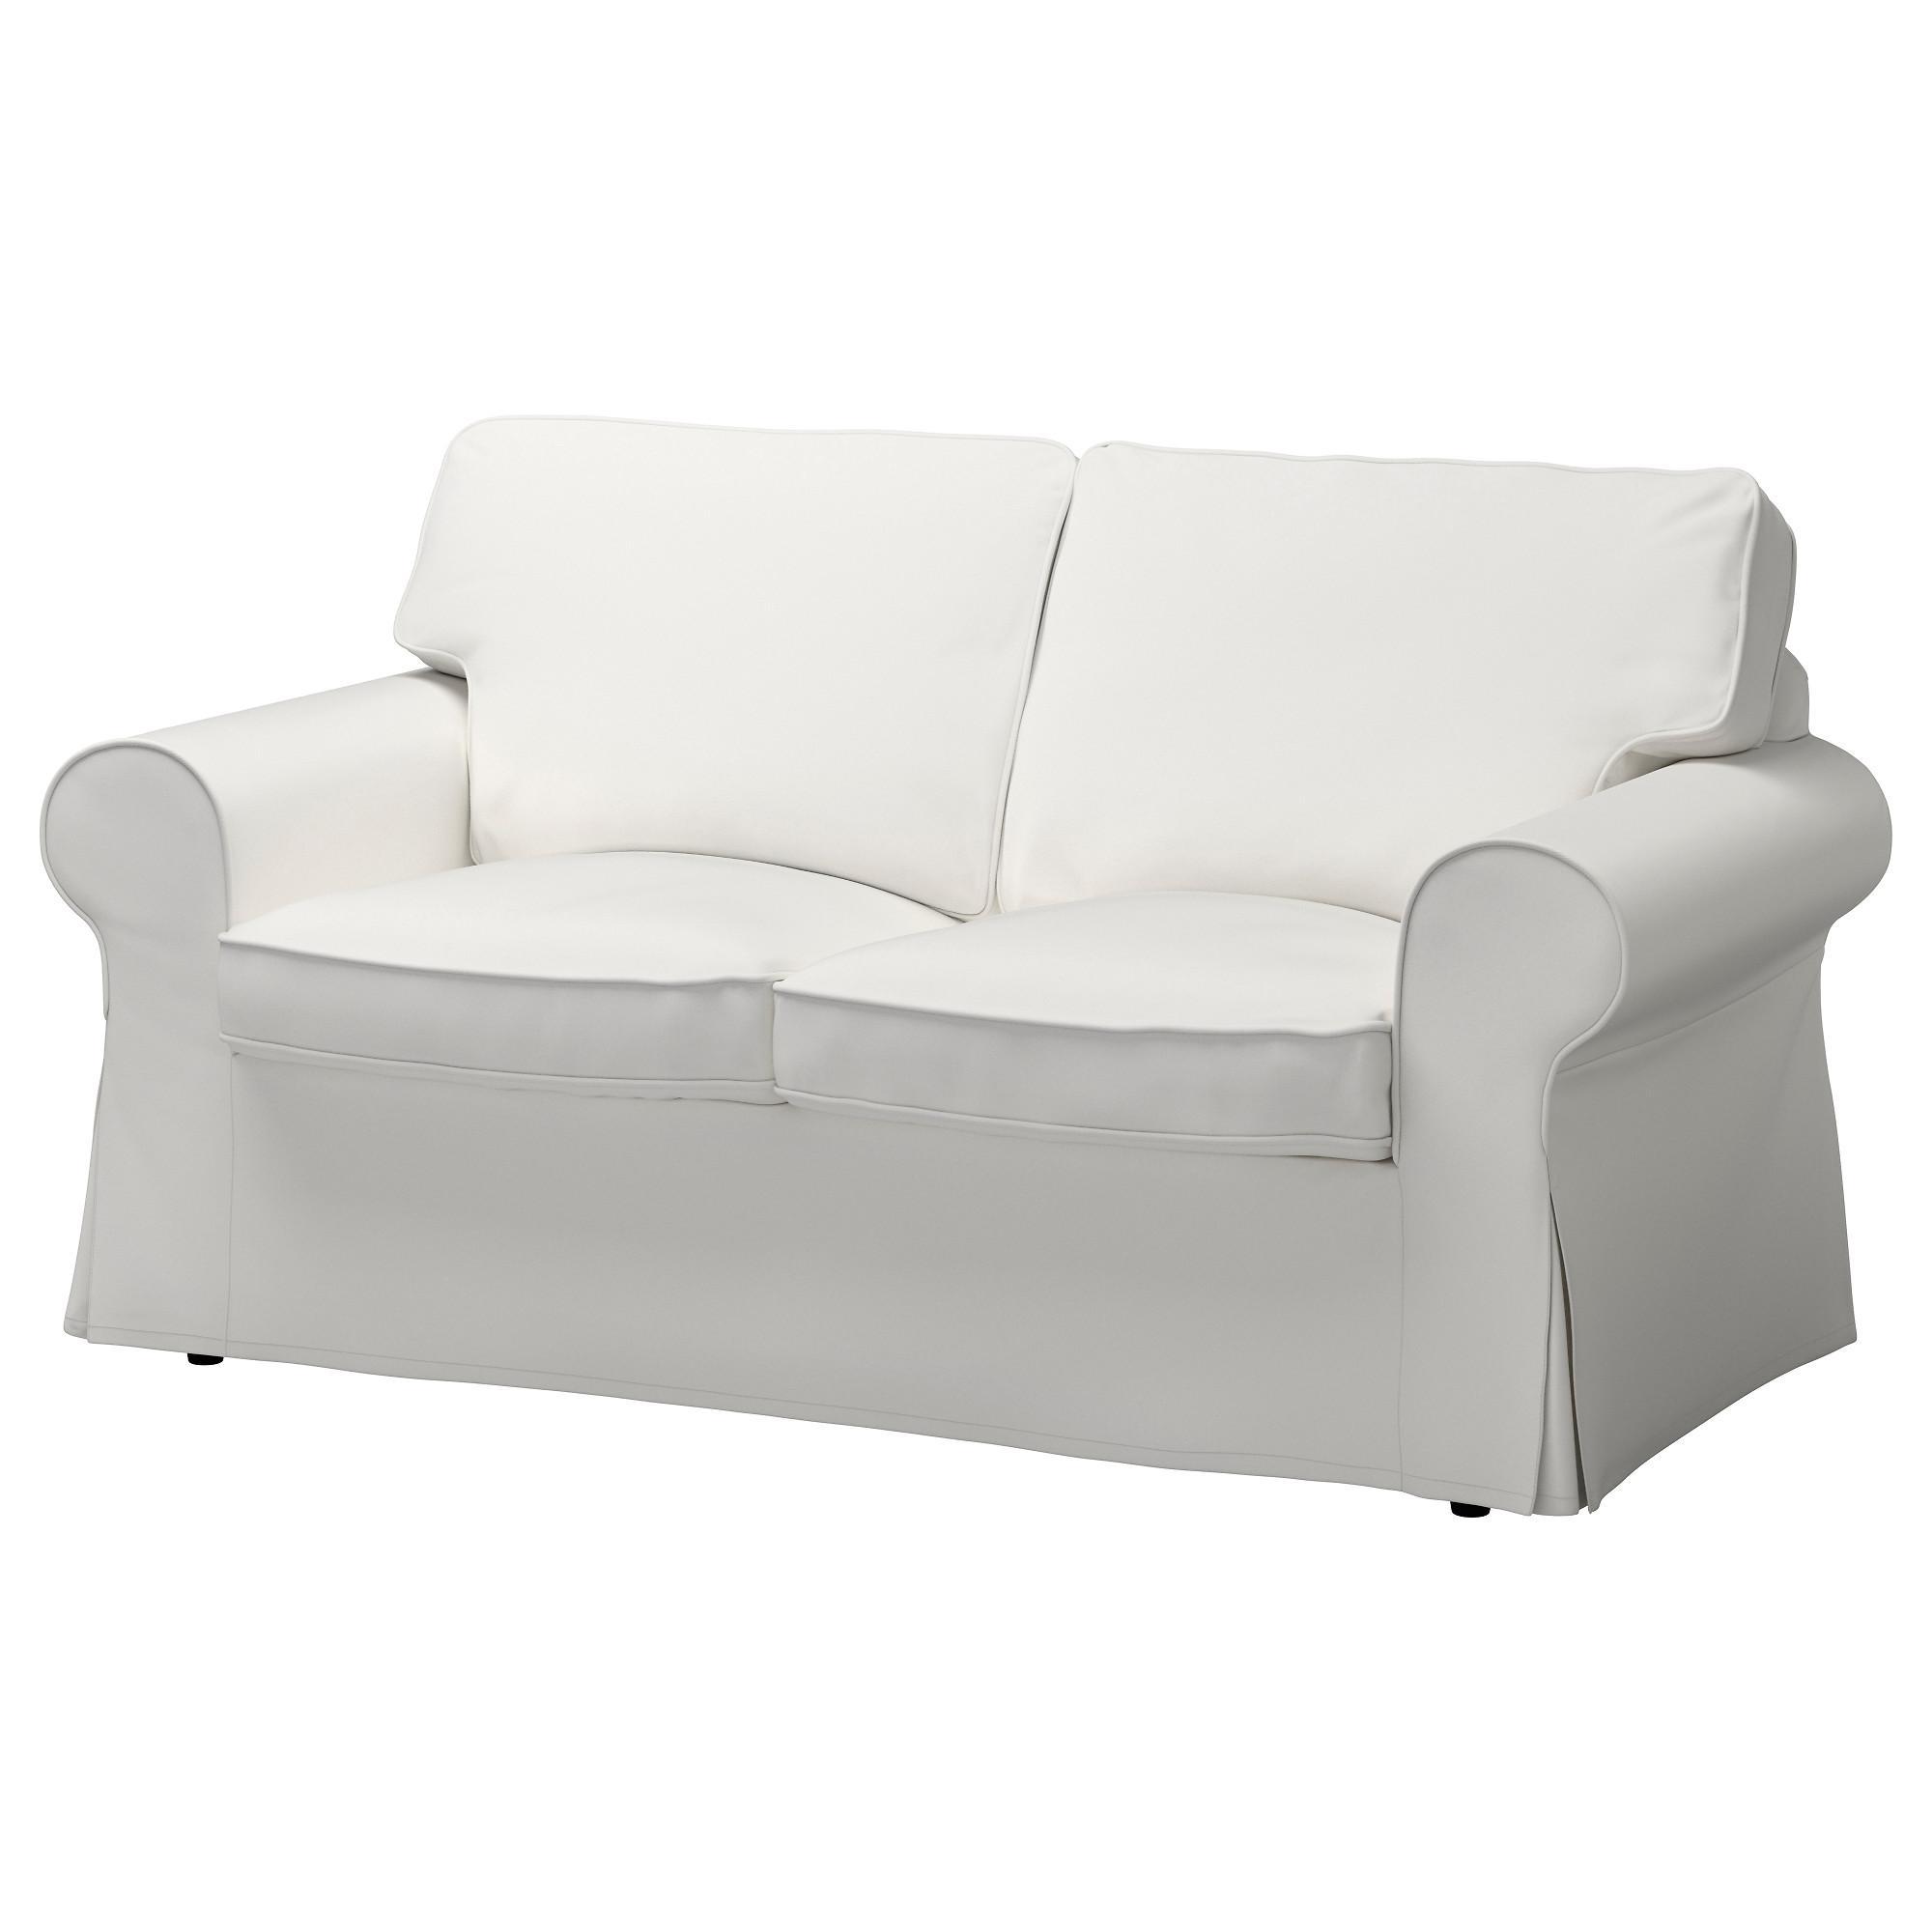 Fabric Sofas – Modern & Contemporary – Ikea With Regard To White Modern Sofas (View 15 of 20)